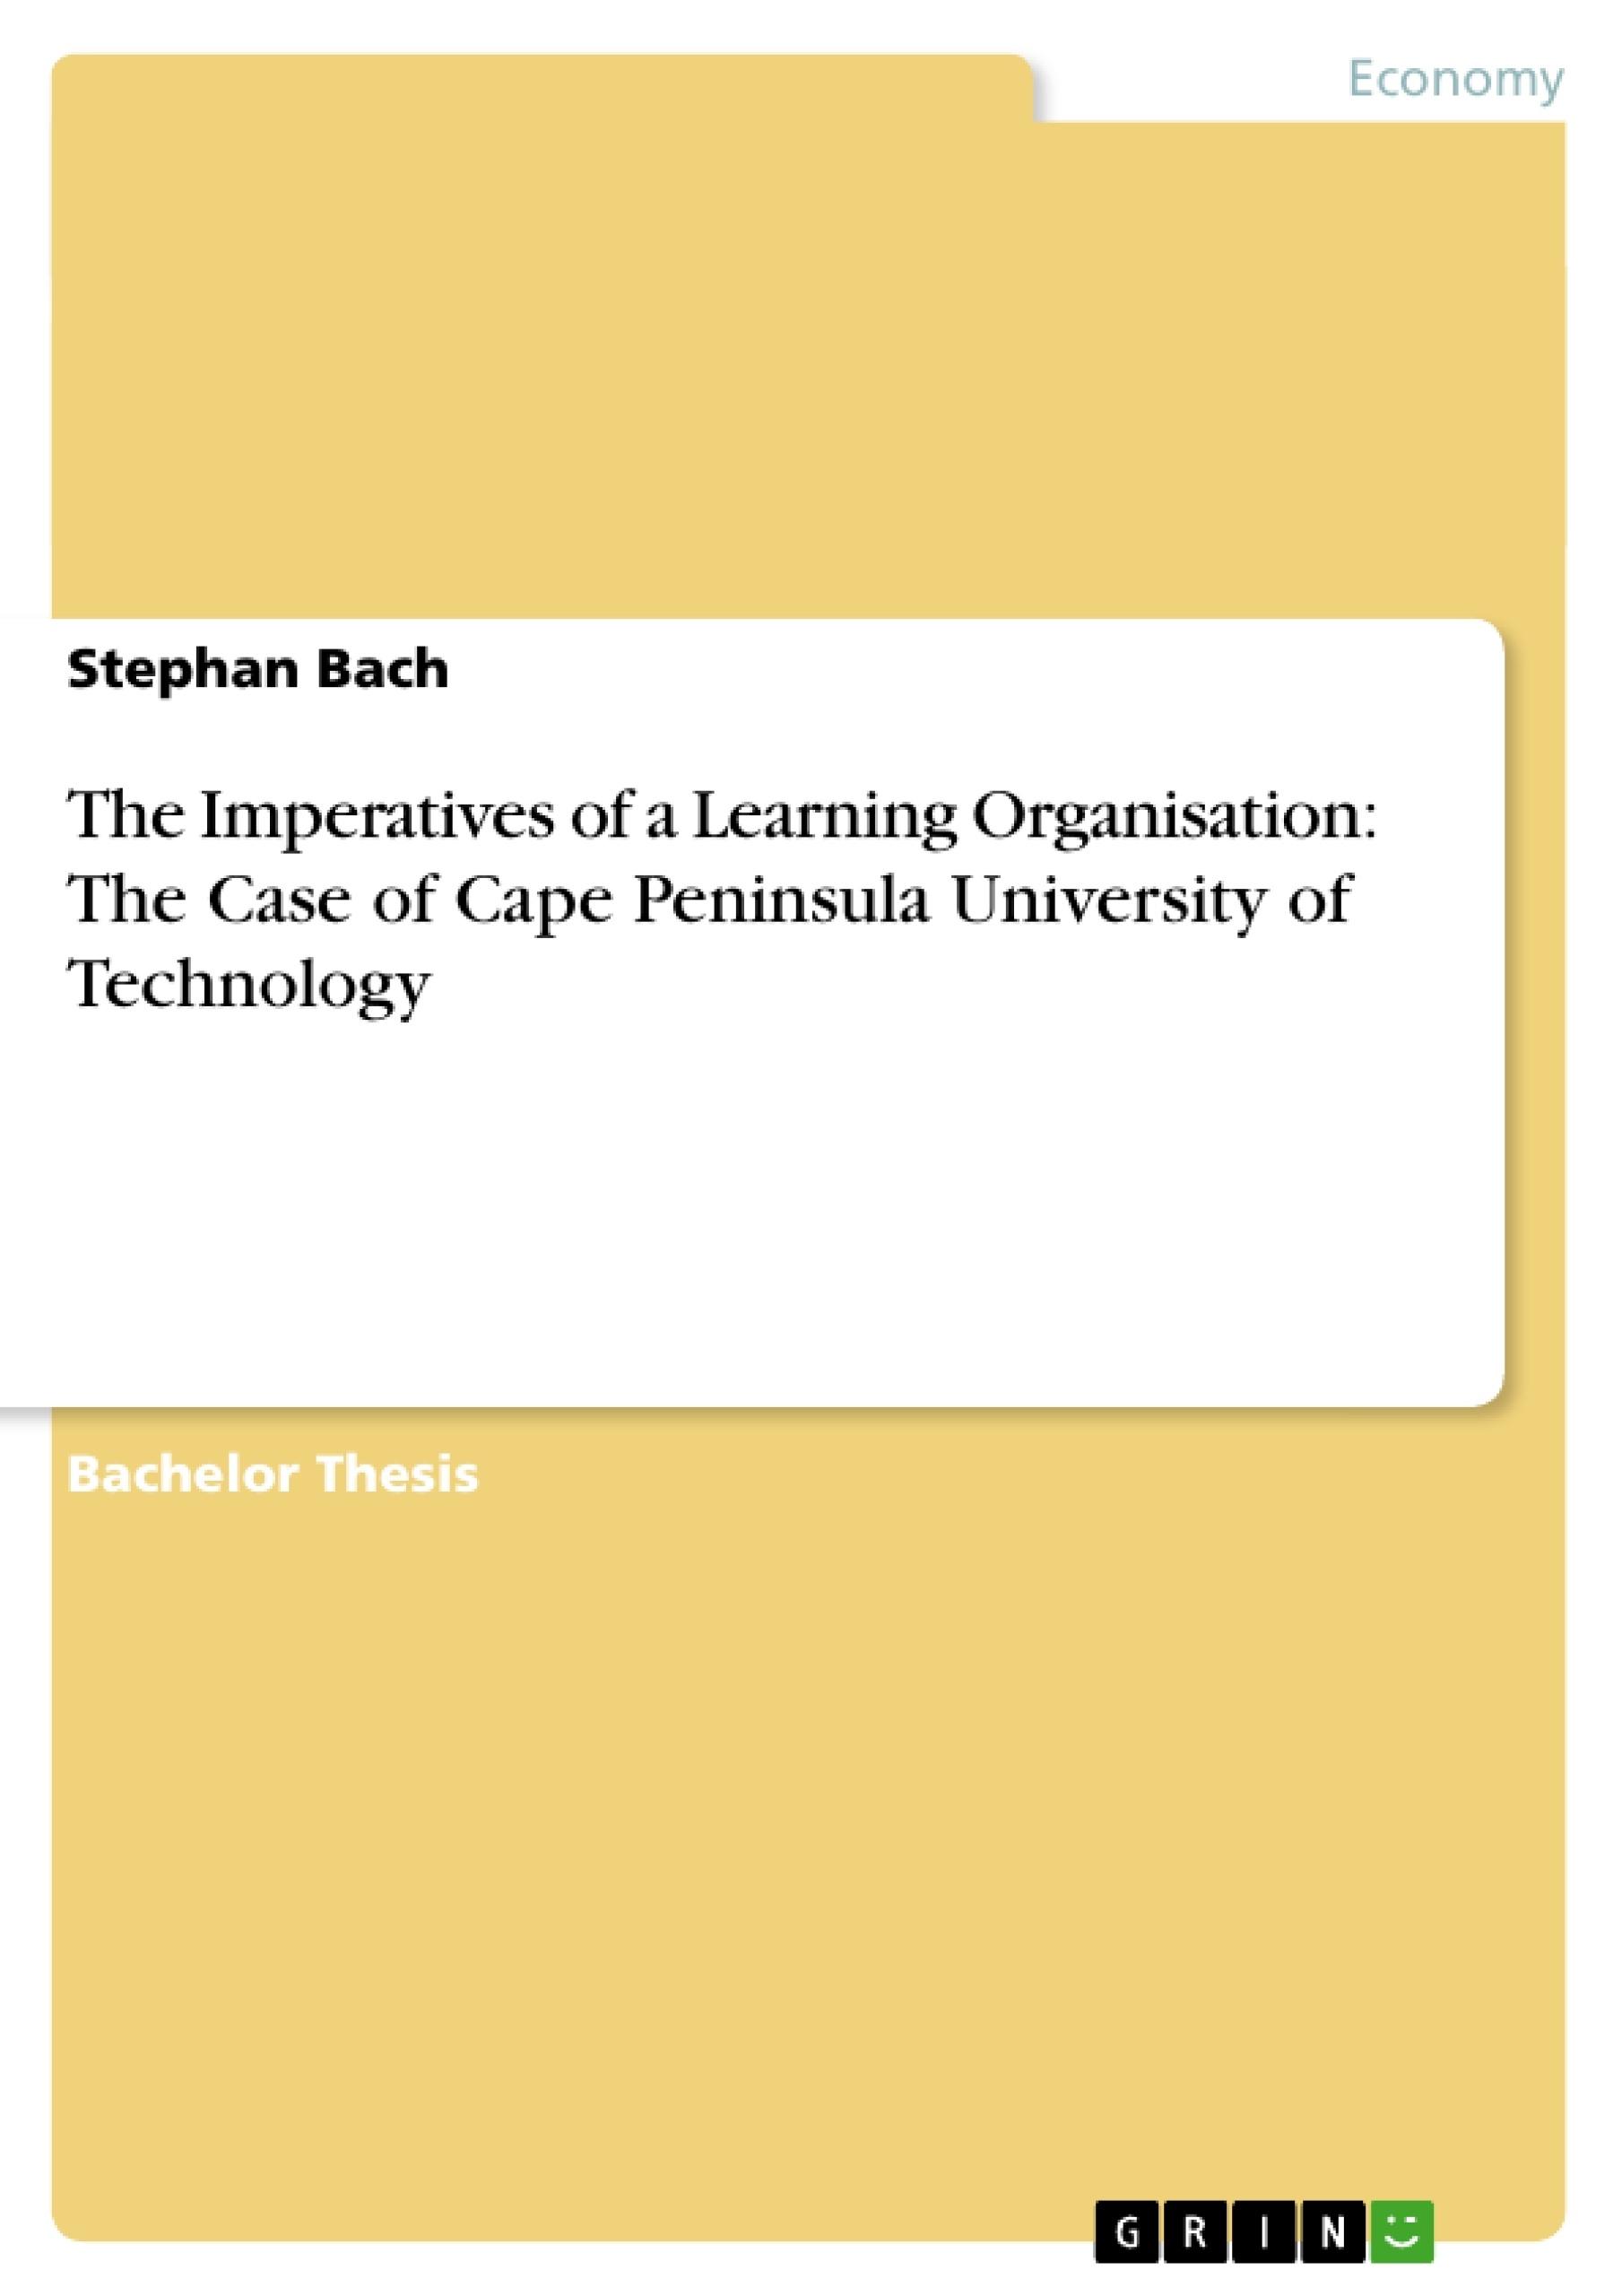 essay on learning organisation